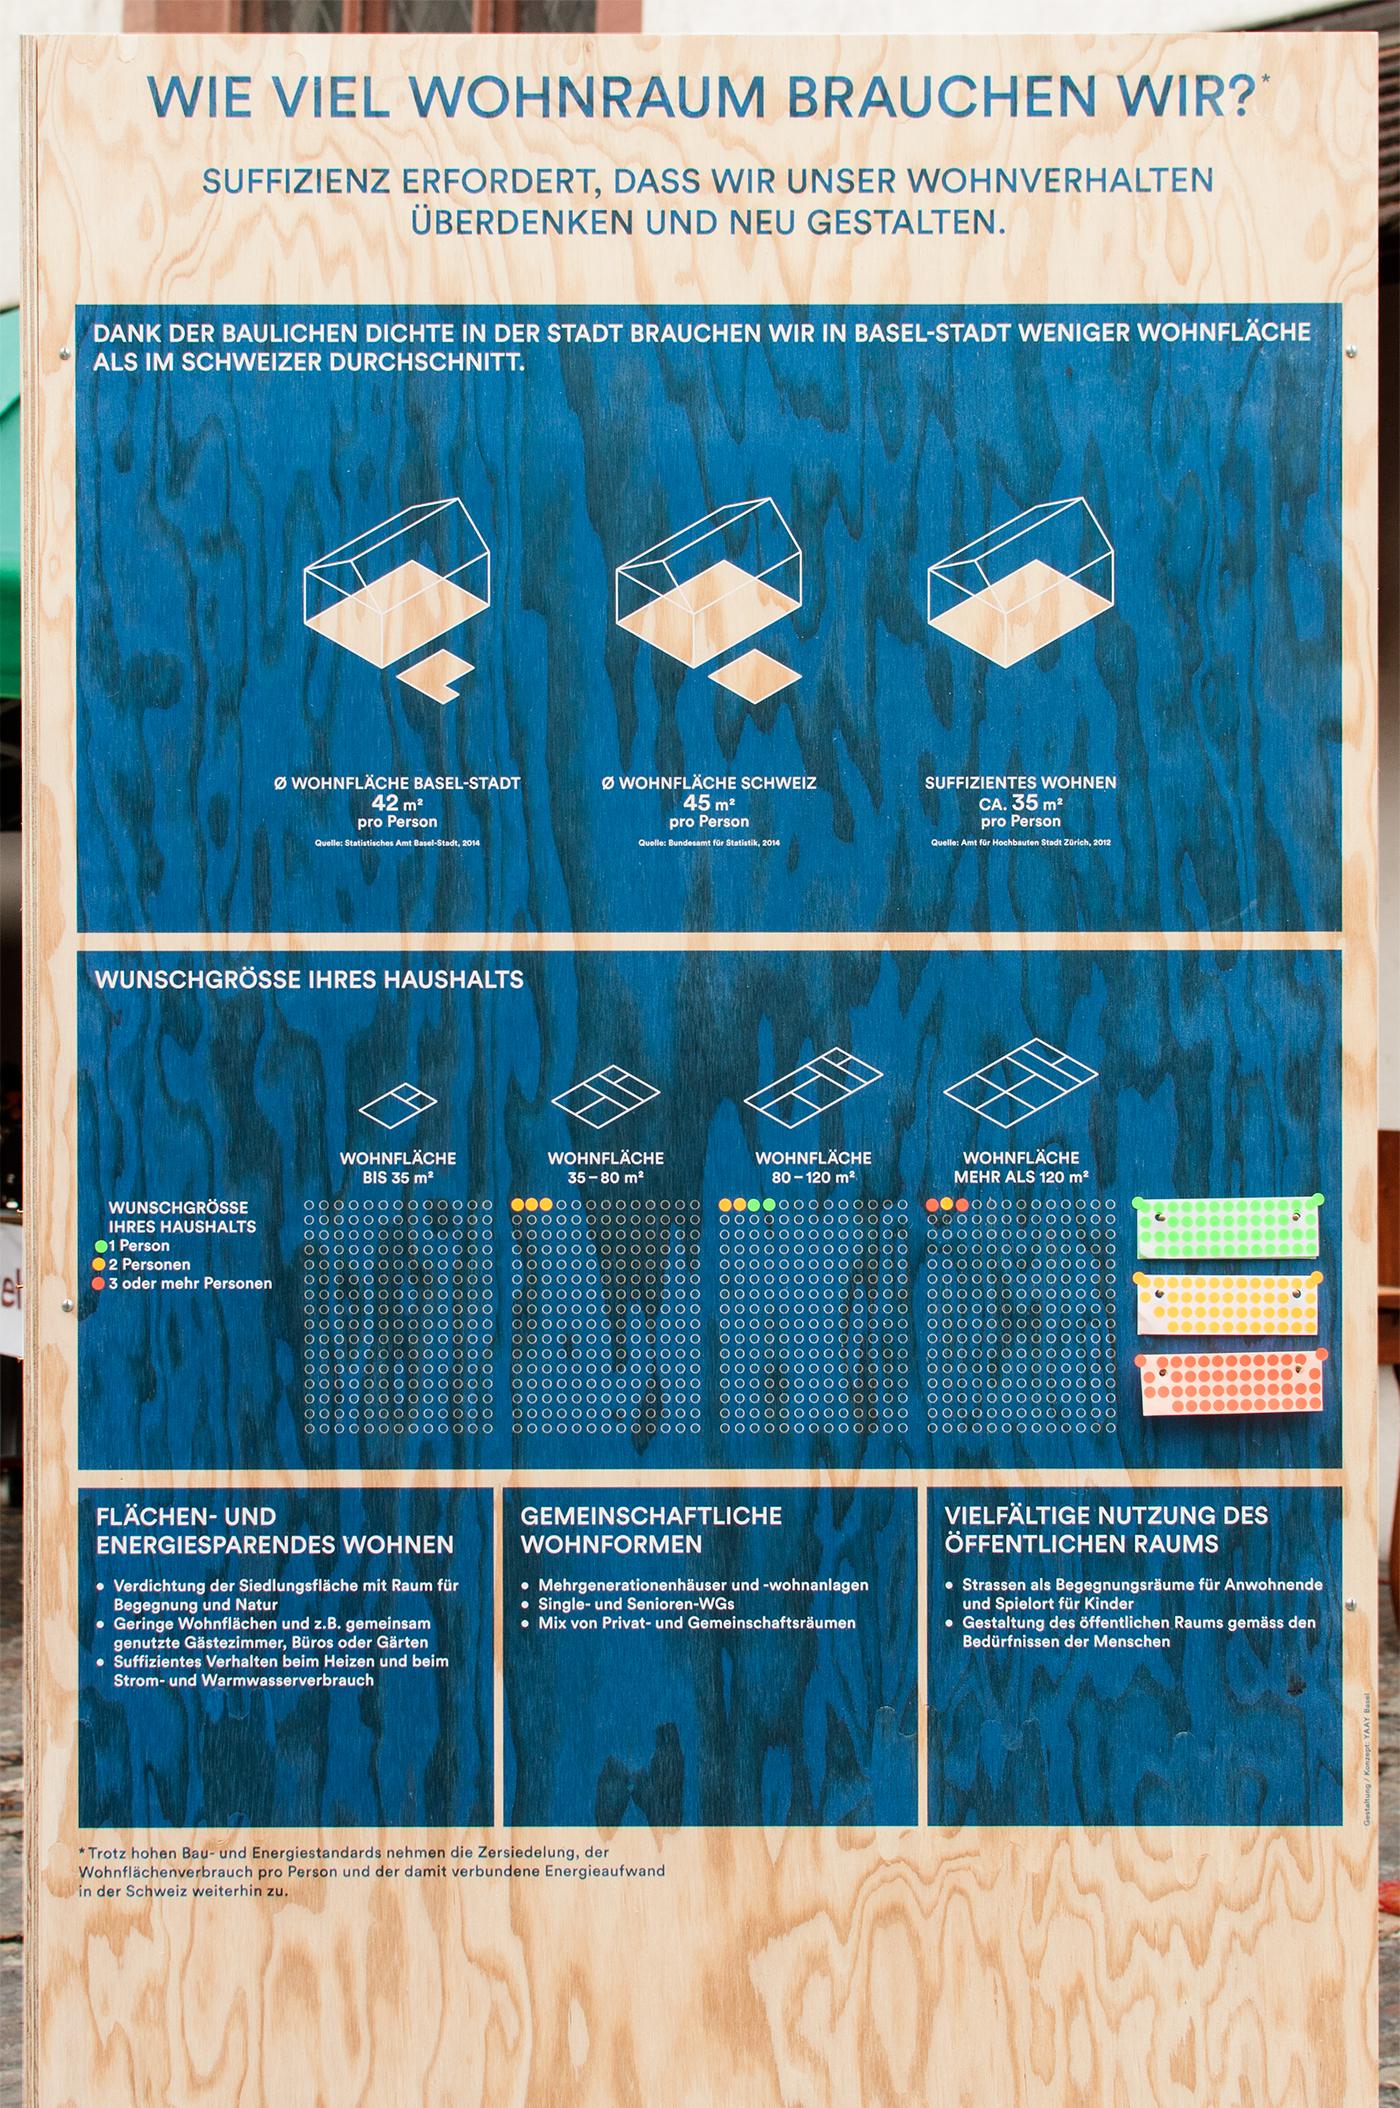 city development information design YAAY Icon Design YAAY Info Graphics YAAY Analog Tools Basel sufficiency icons